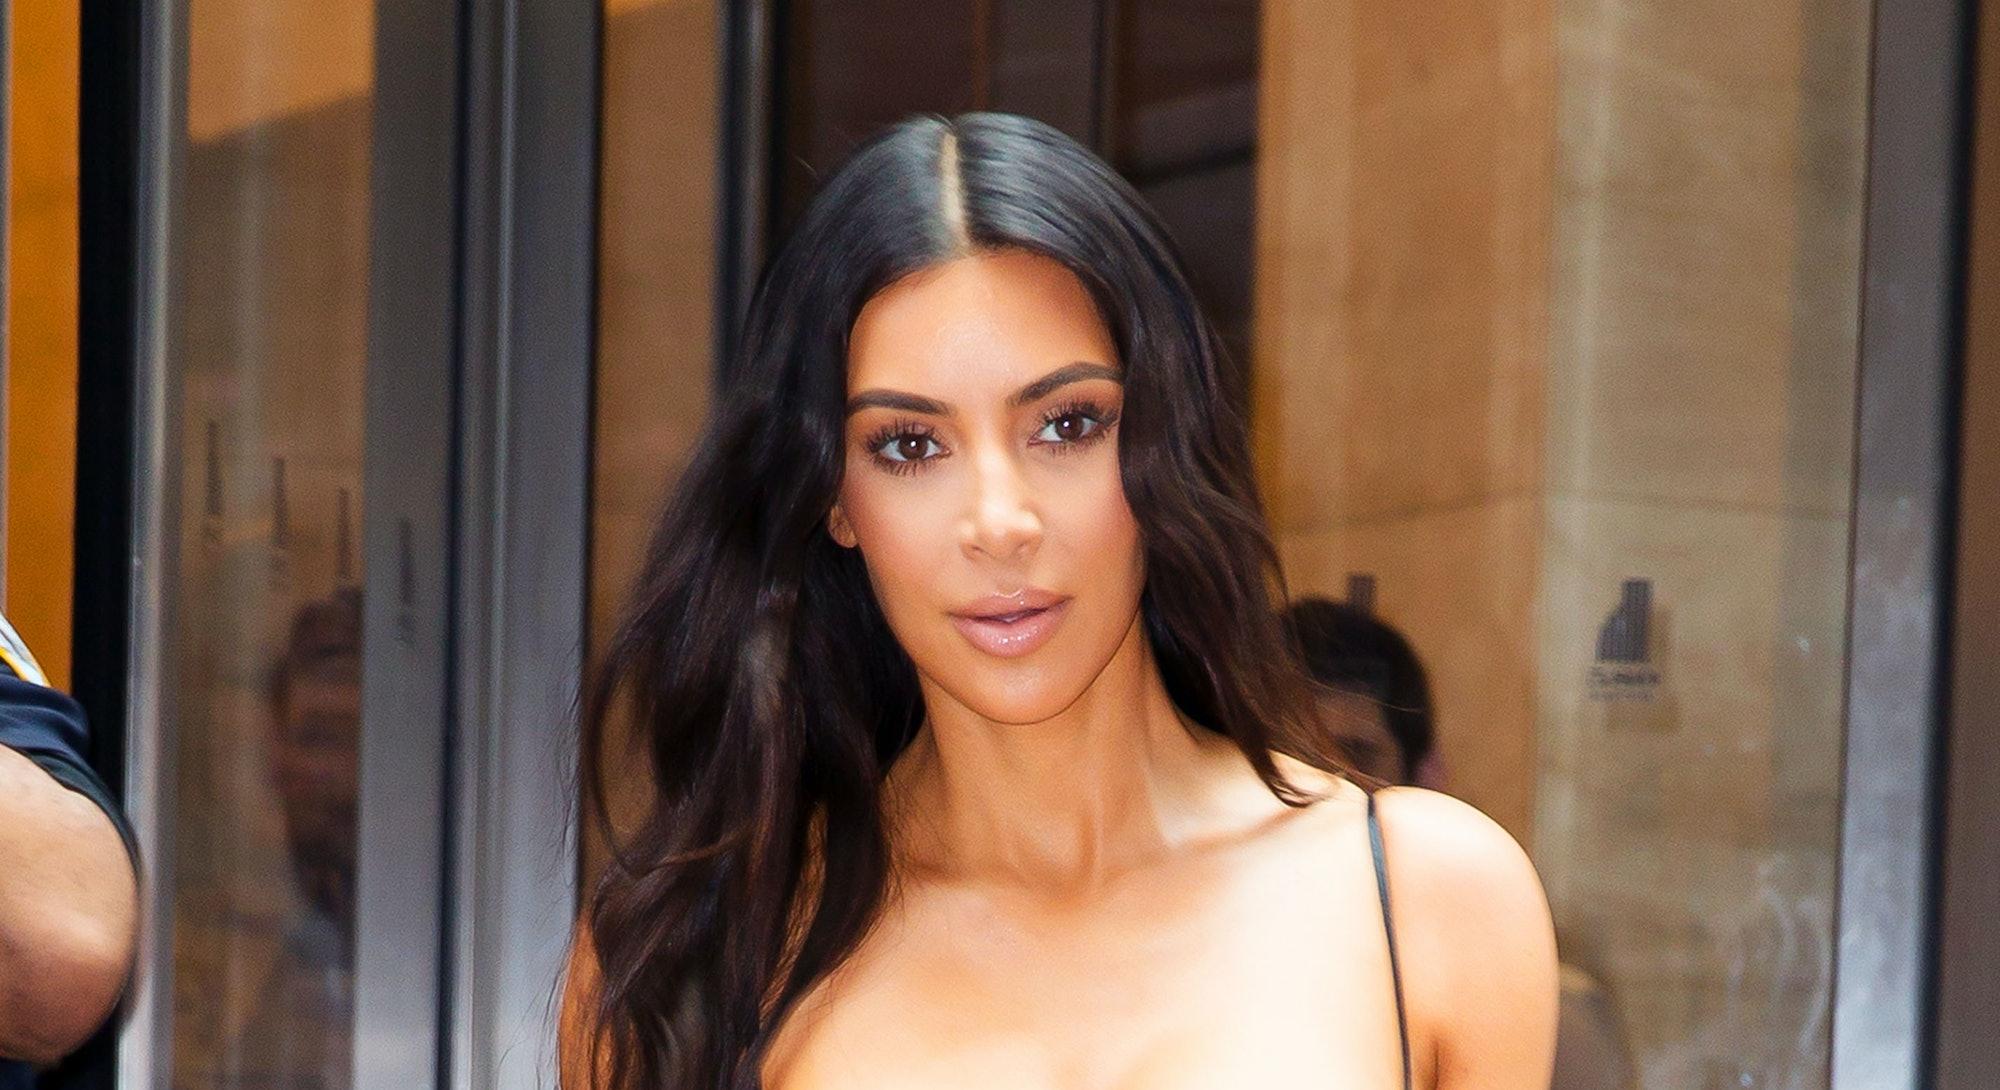 NEW YORK, NY - JUNE 14:  Kim Kardashian departs a jeweler's office on June 14, 2017 in New York City...